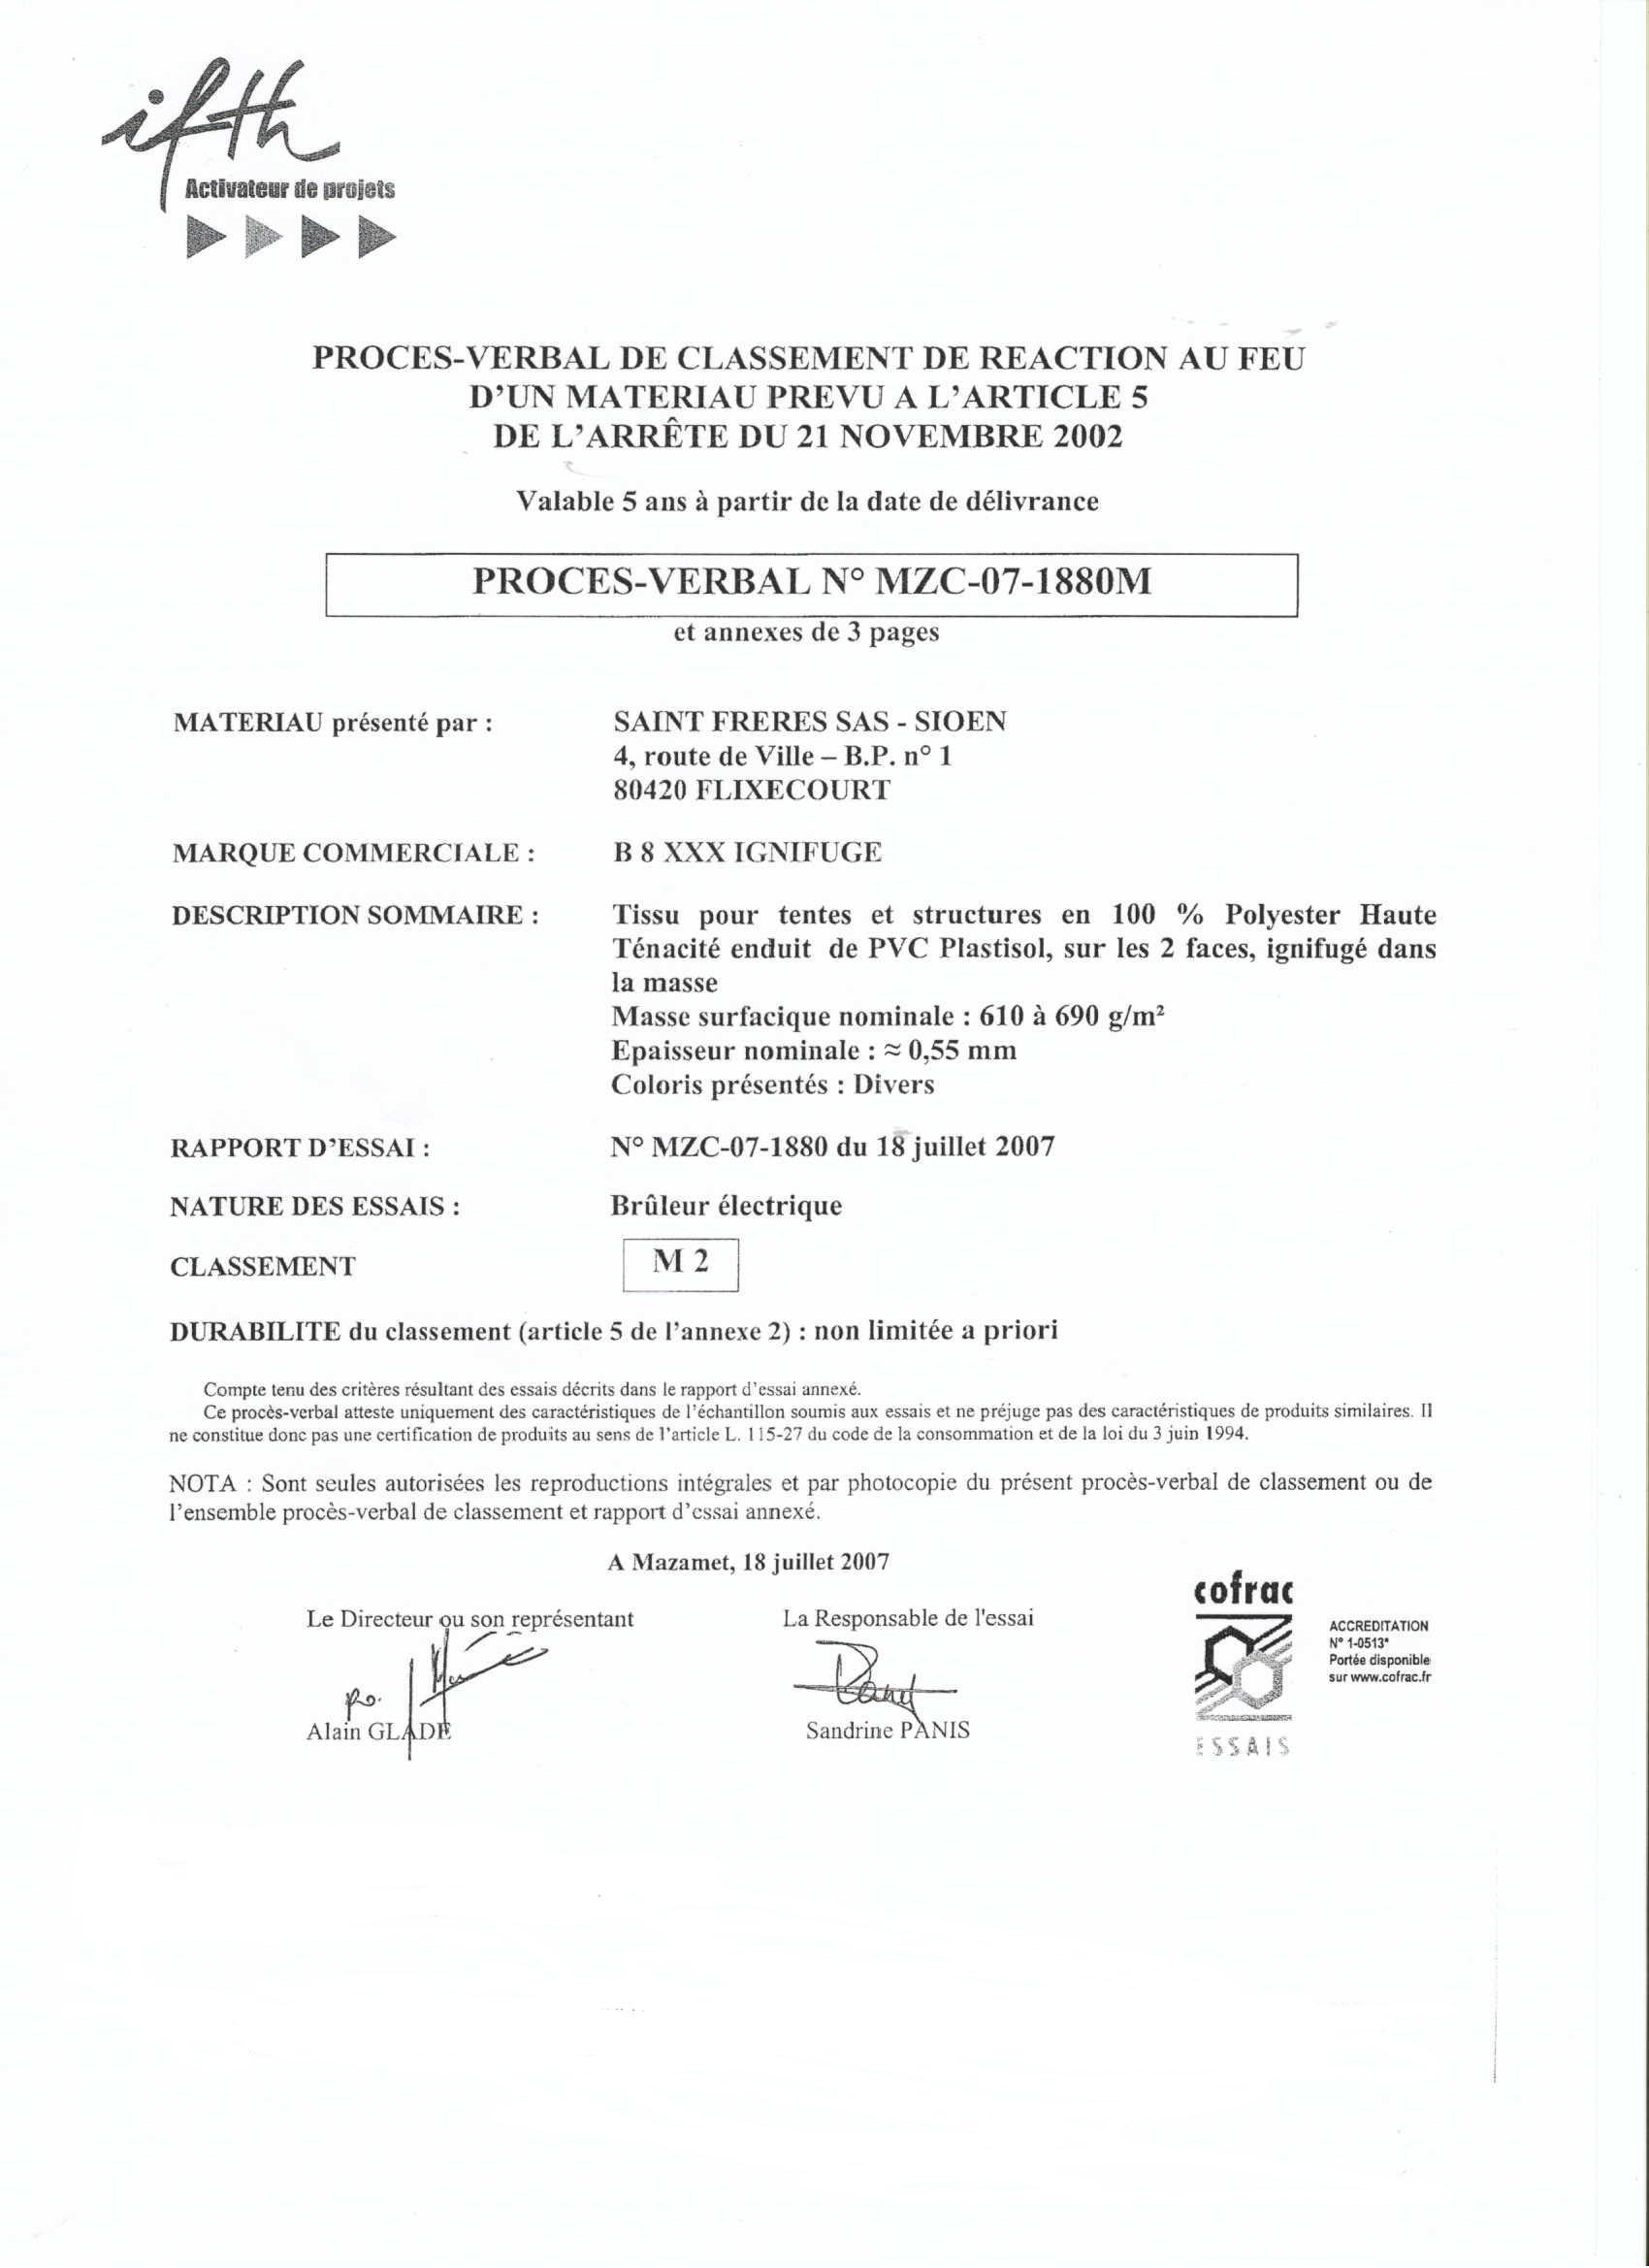 M2 flame retardant certificate